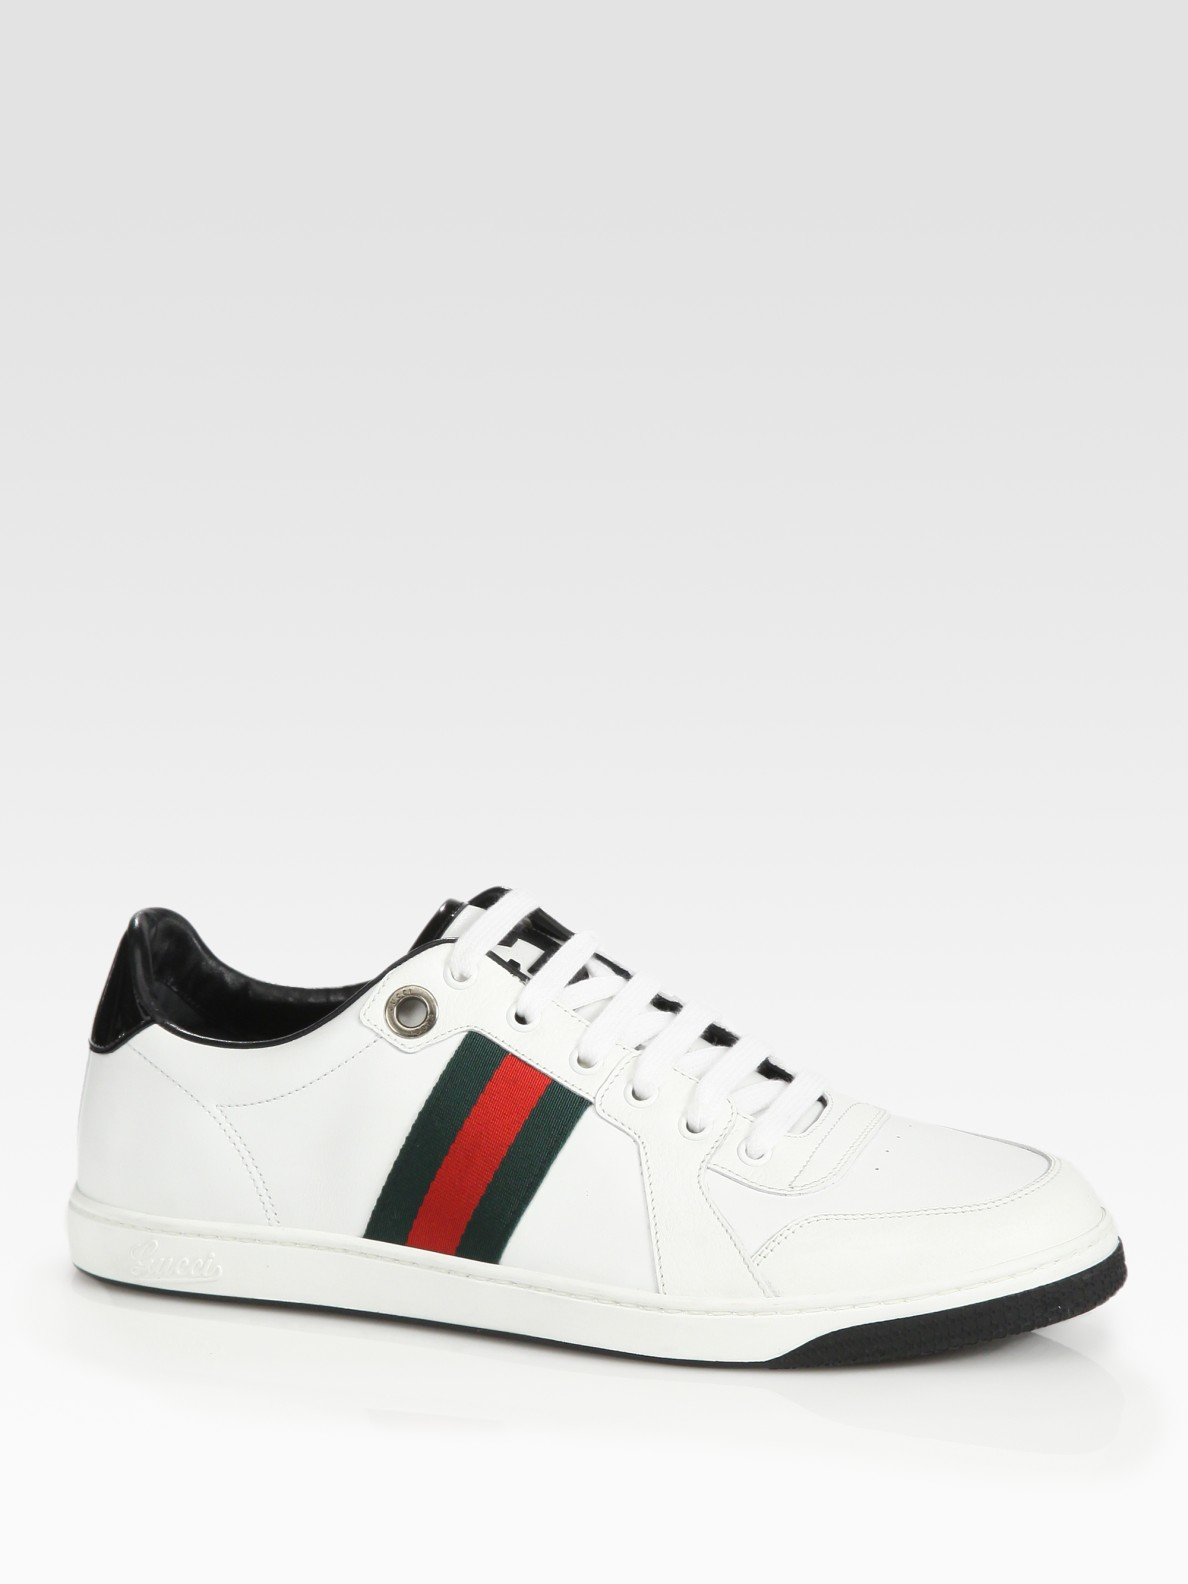 Gucci Classic Sneaker in Black (White